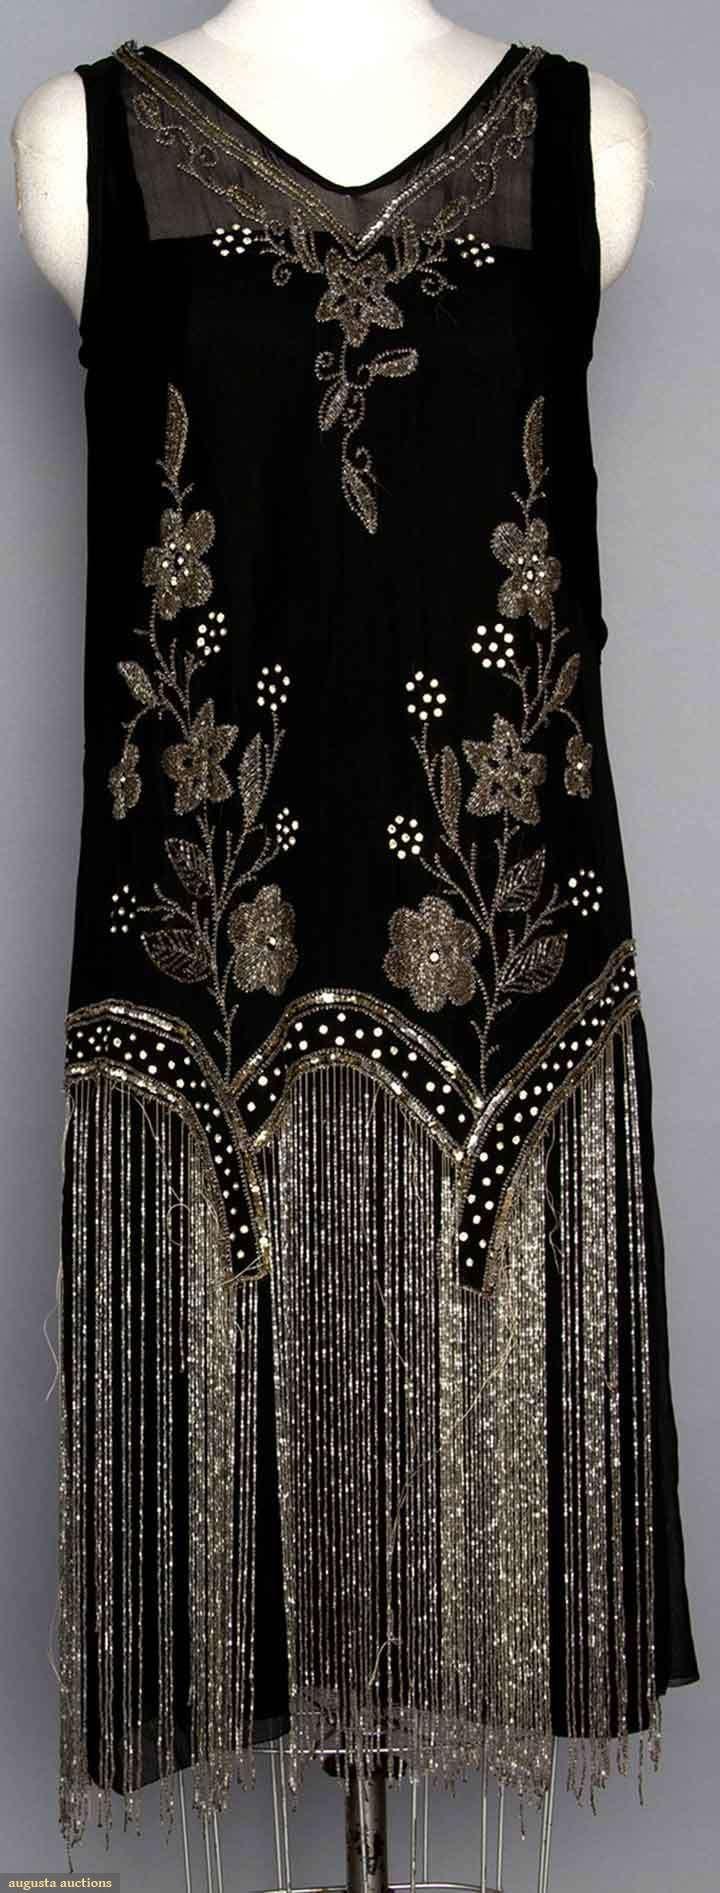 Augusta Auctions, backside, Beaded 1920's flapper dress. Black silk w/ crystal beads & long beaded fringe.